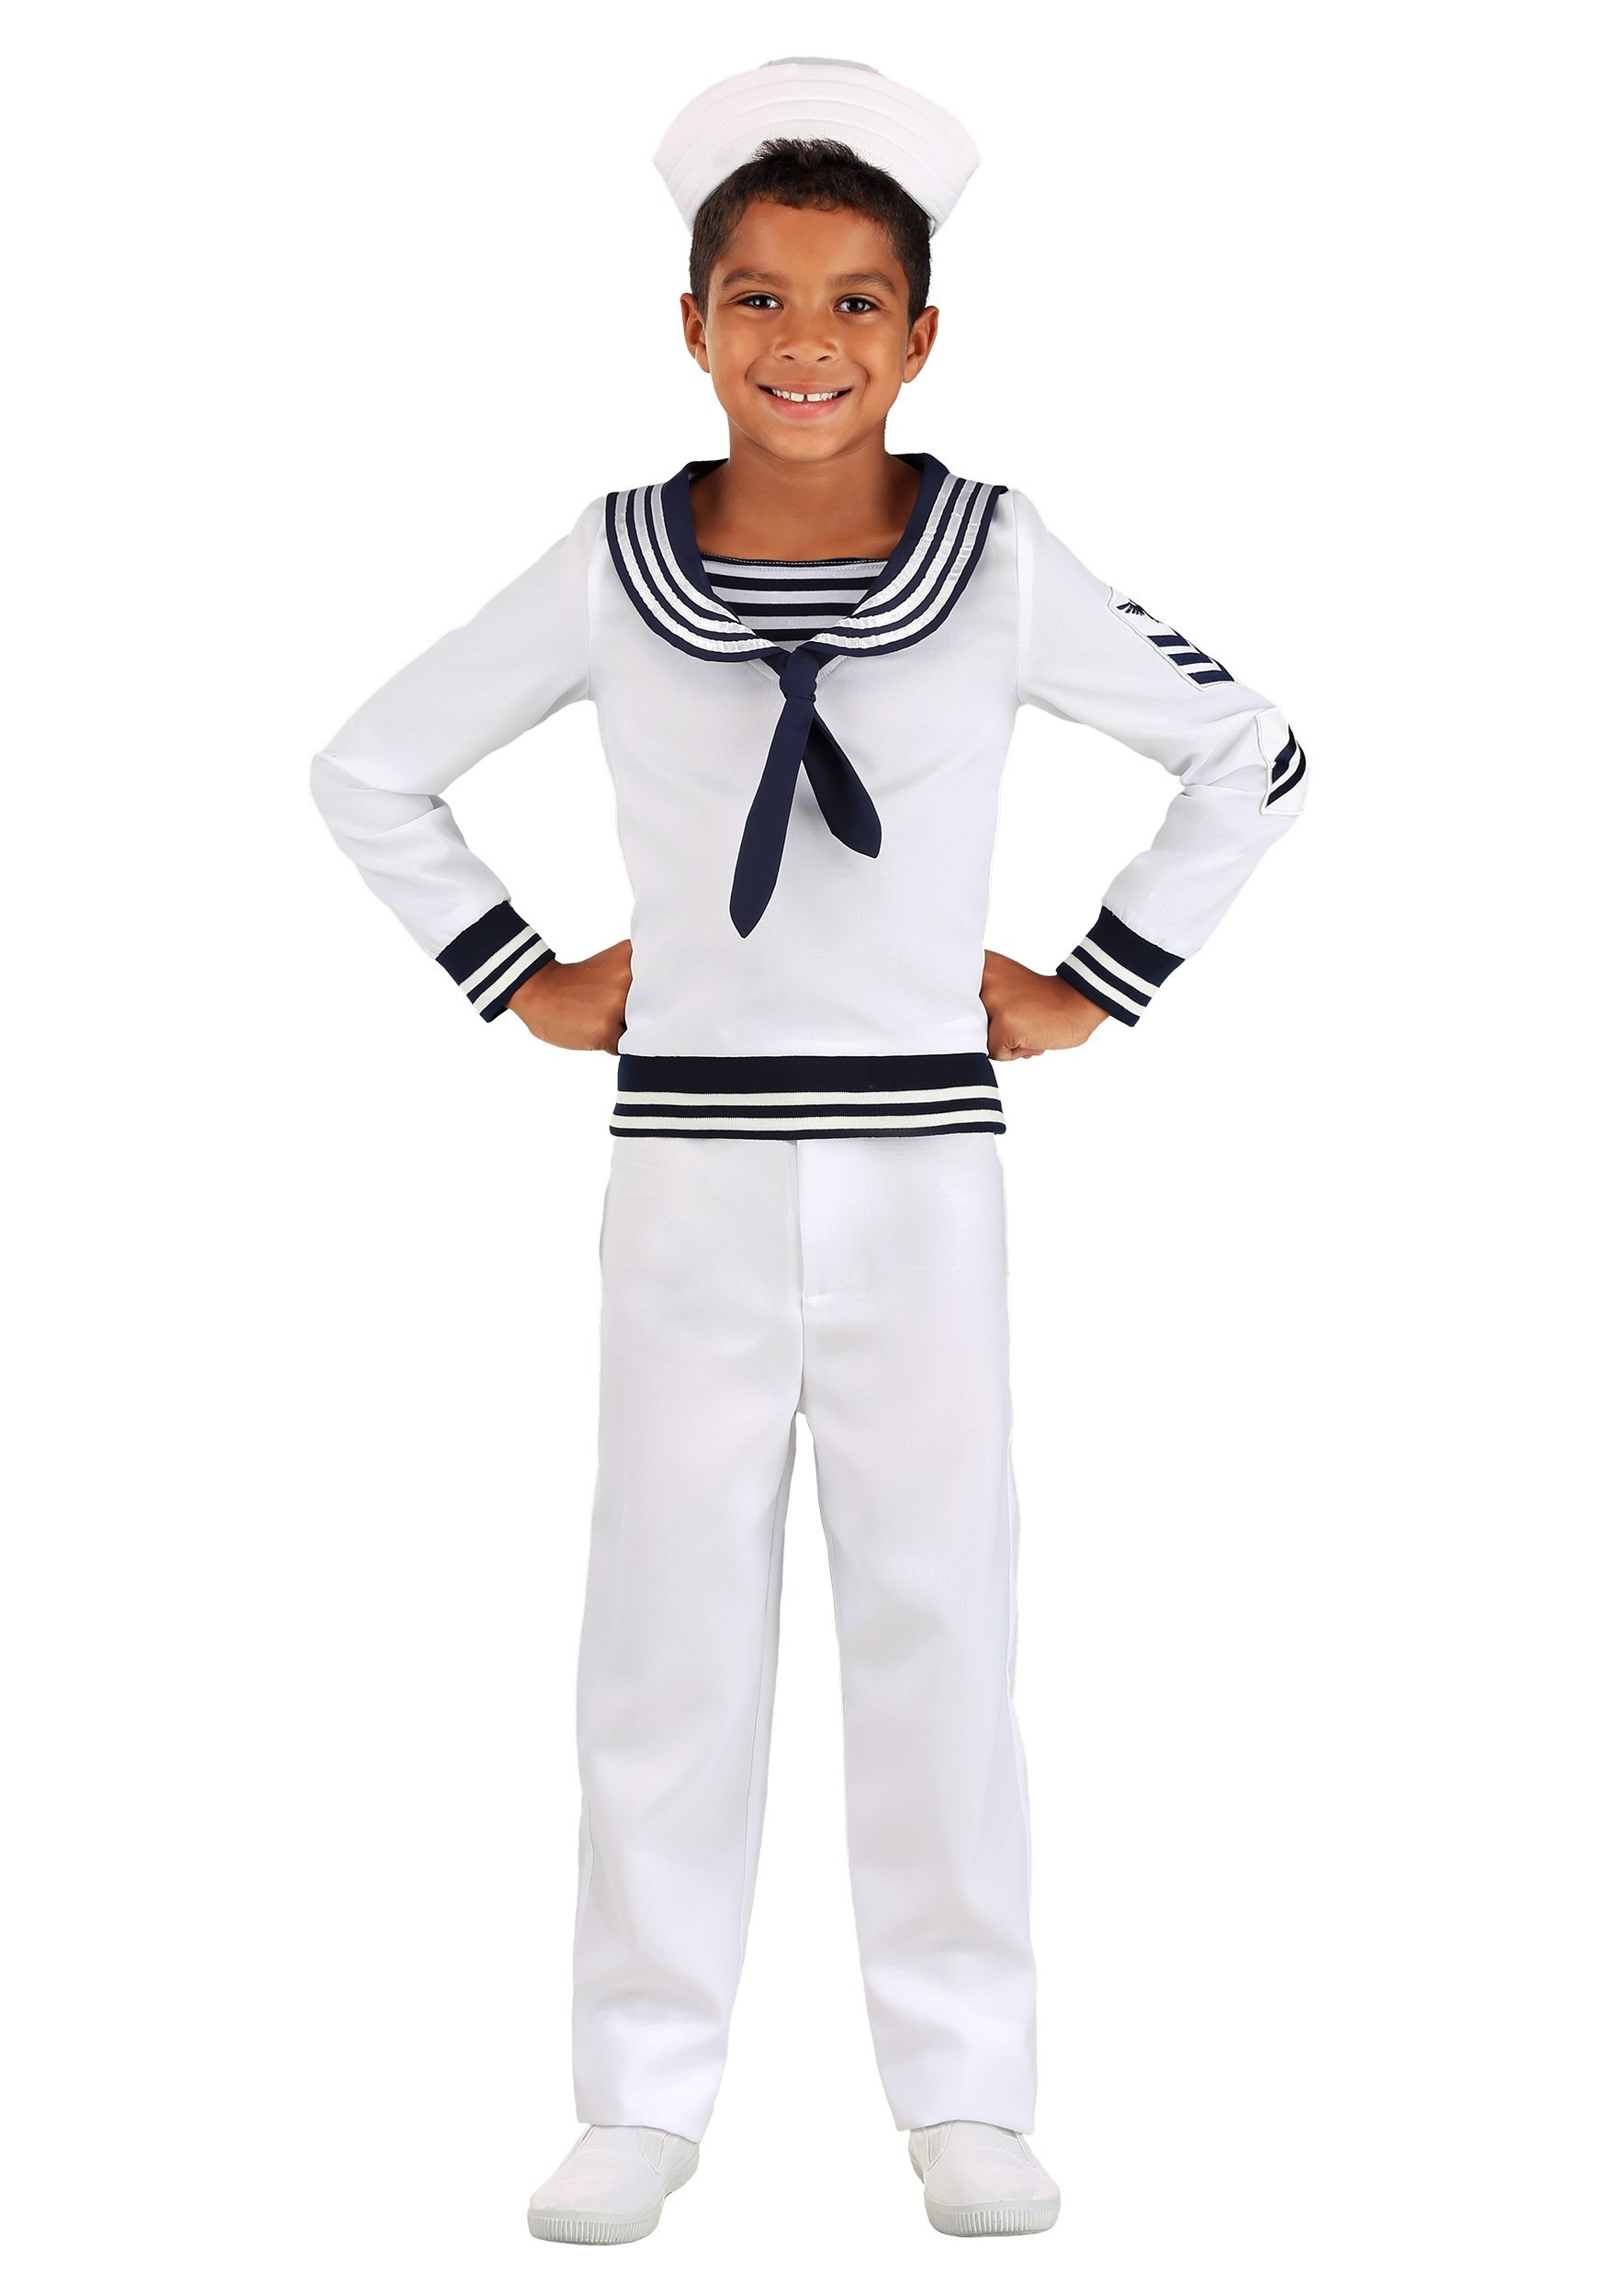 Deckhand Sailor Costume for Boys